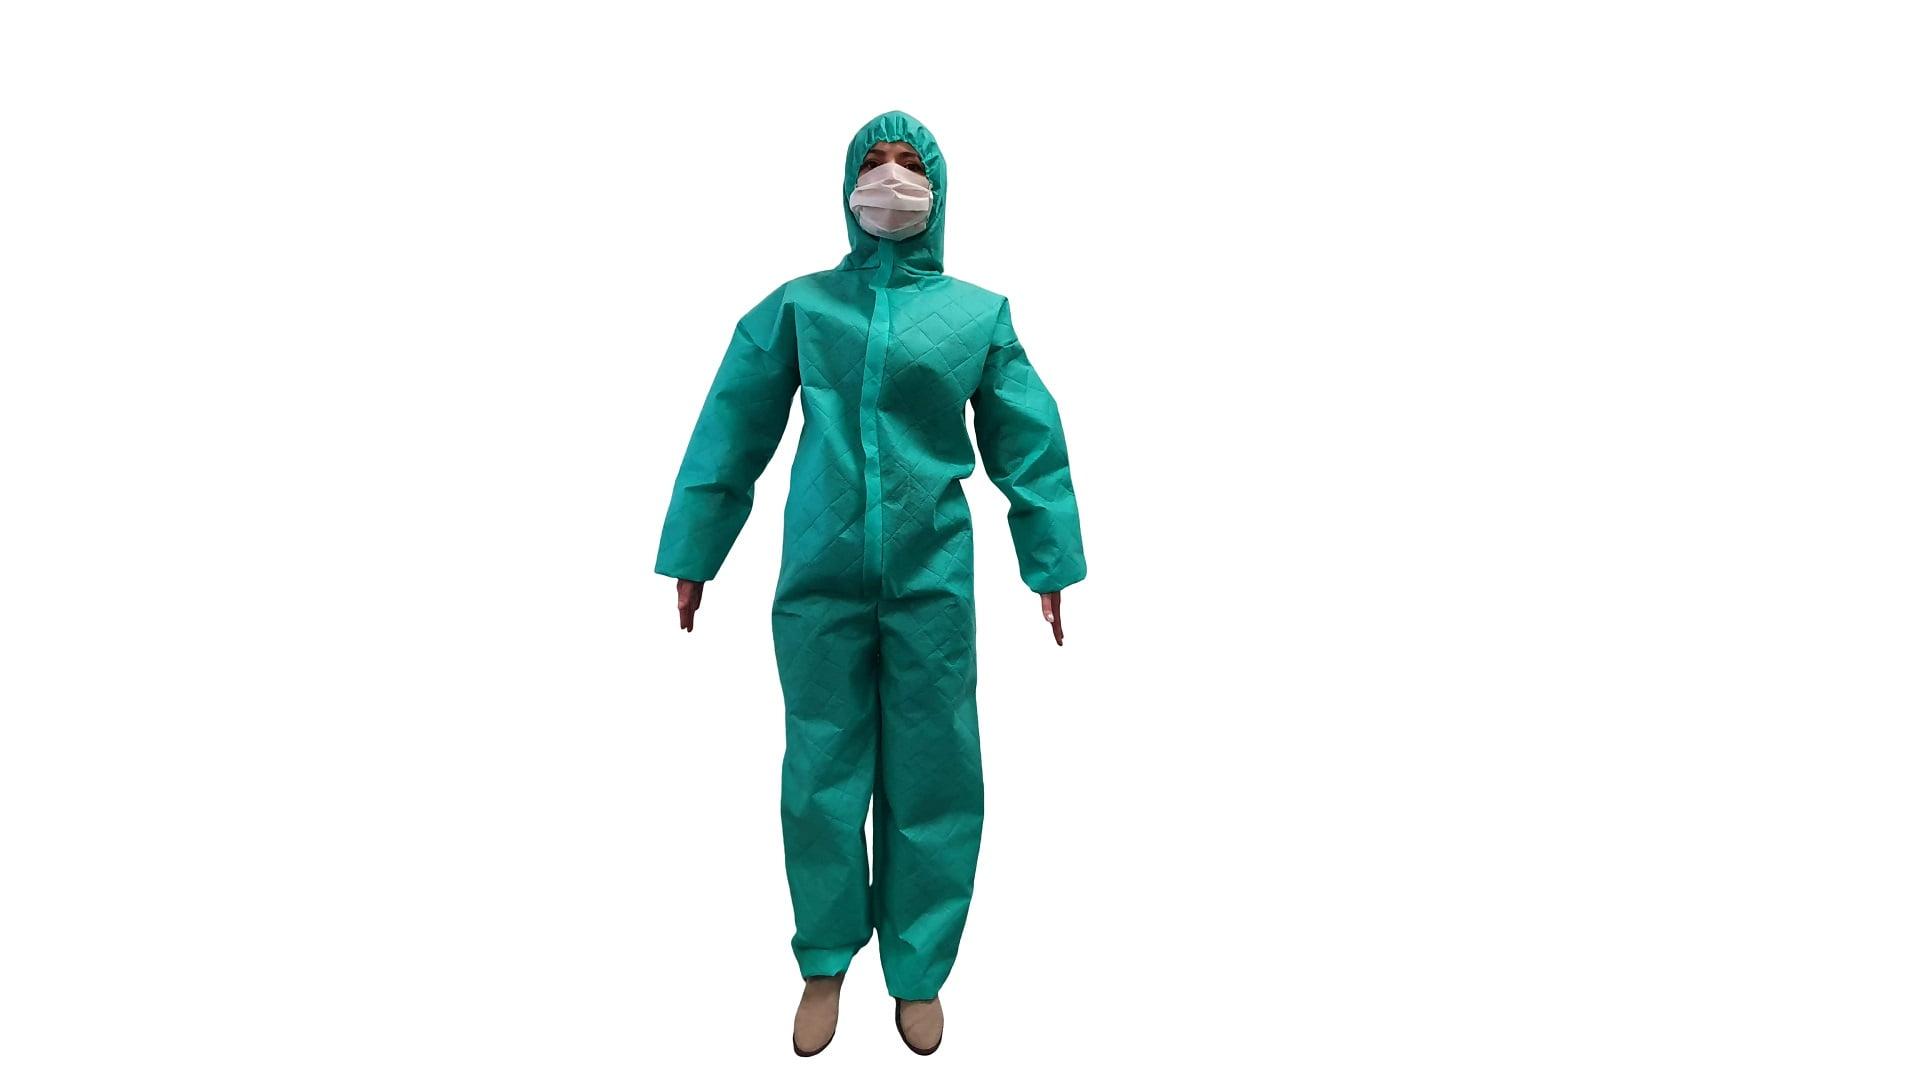 Combinezon Protectiv, material netesut, cu fermoar, gluga si elastice, autoclavabil - XL imagine 2021 somnart.ro